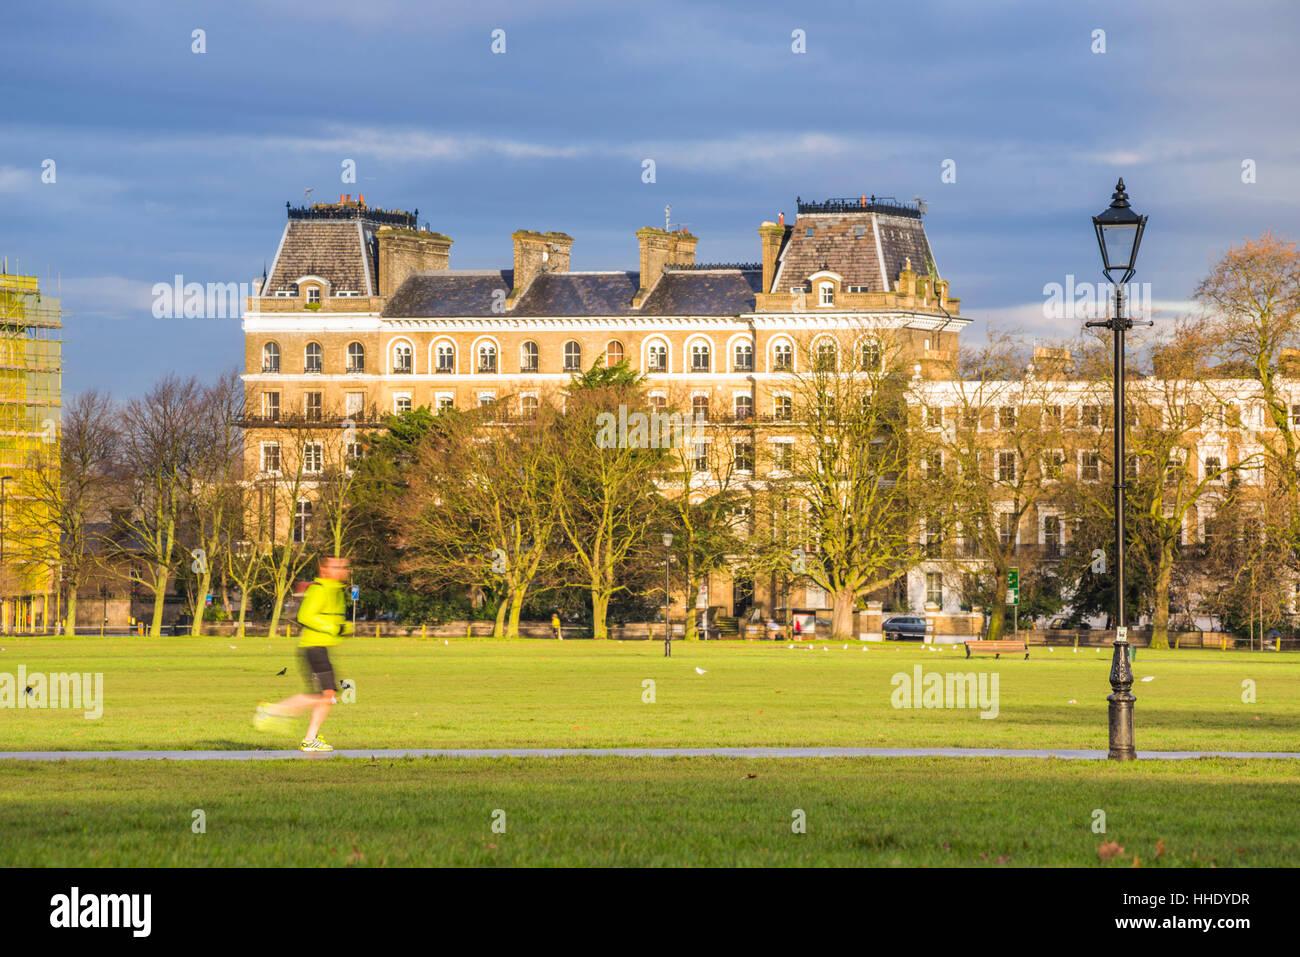 Jogger jogging on Clapham Common, Lambeth Borough, London, UK - Stock Image